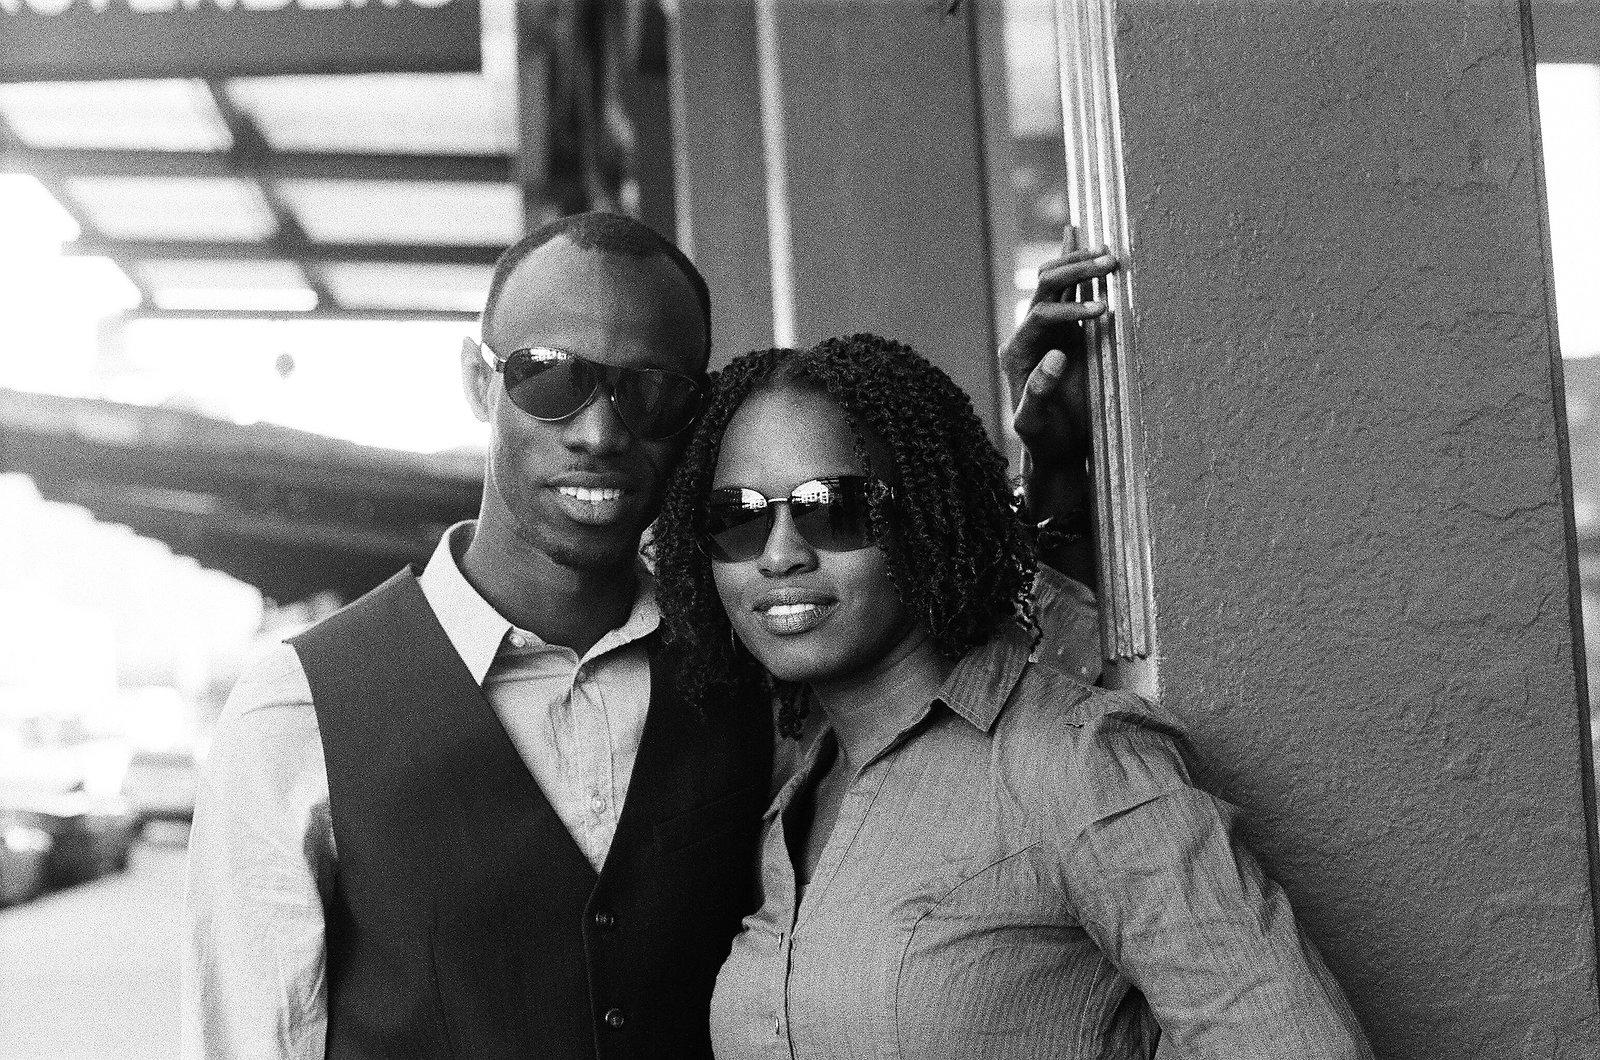 black and white photo of engaged couple smiling wearing sunglasses